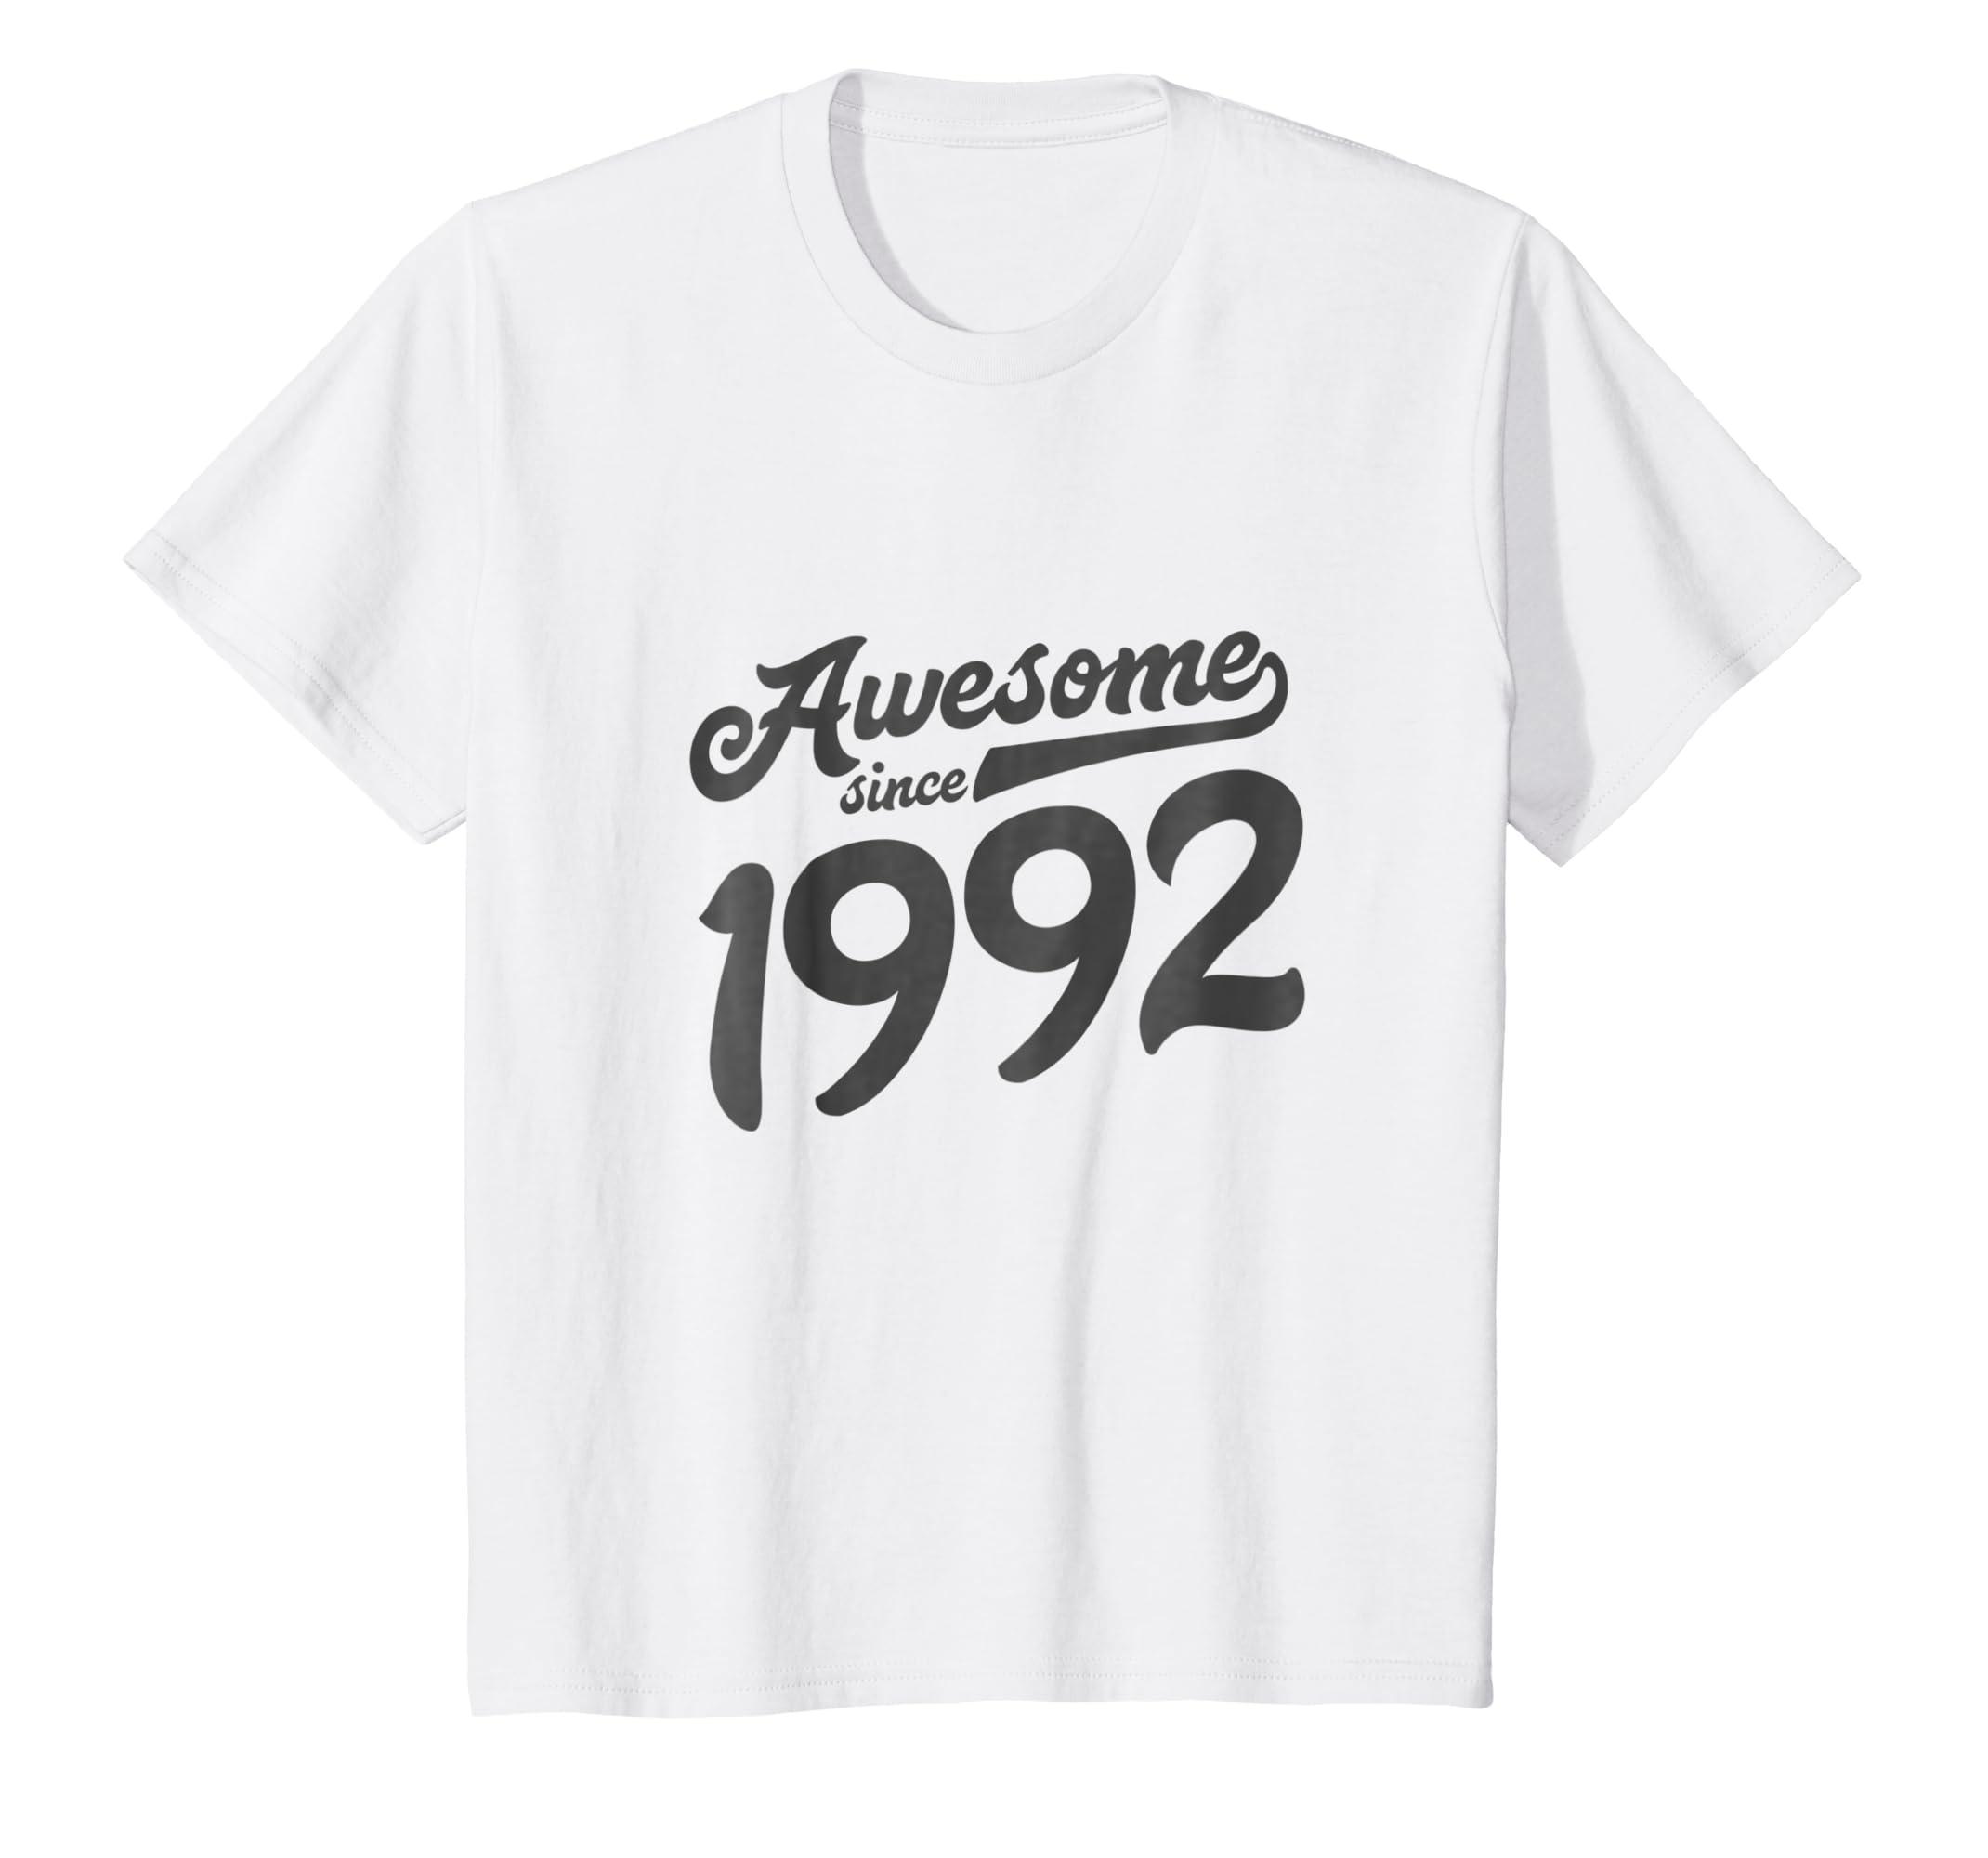 Amazon 27th Birthday Shirt Gift Age 27 Year Men Women Son Daughter Clothing